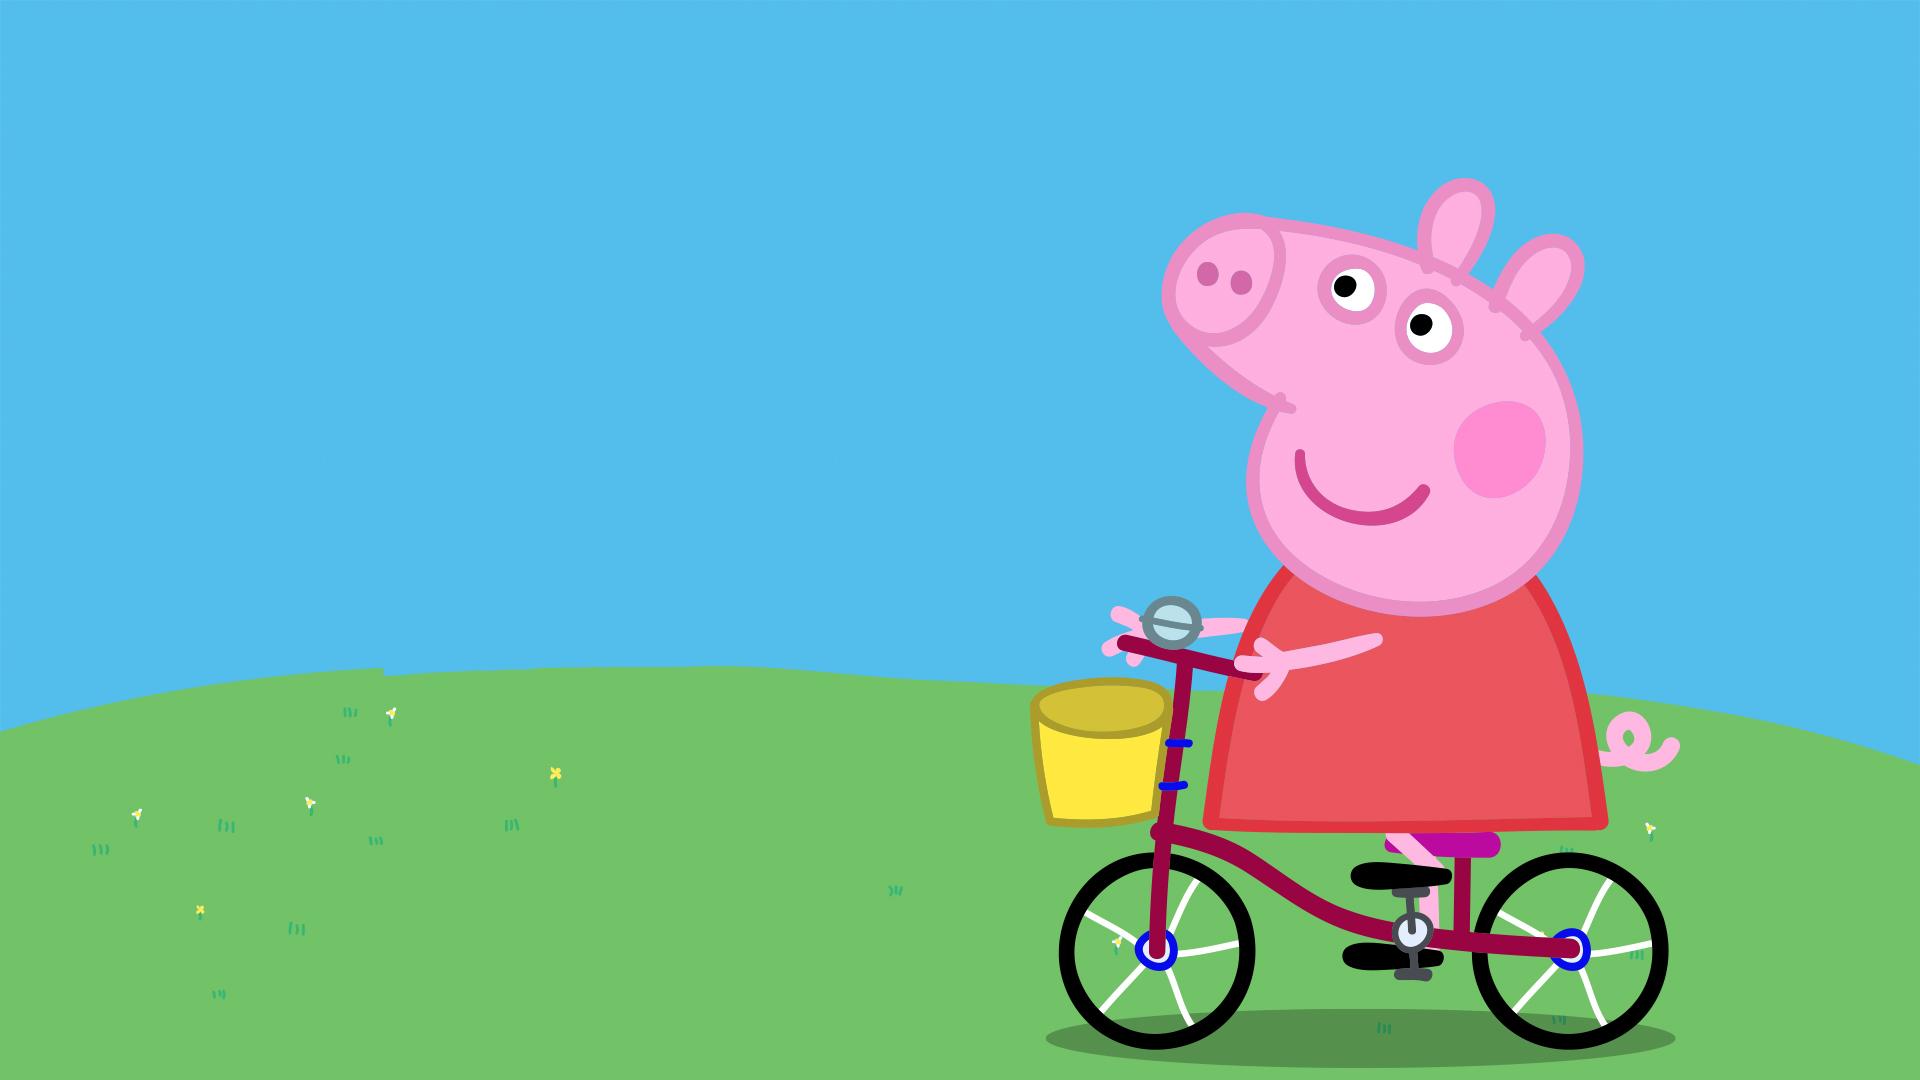 Peppa Pig Wallpaper Hd (#2591411) - HD Wallpaper & Backgrounds ...